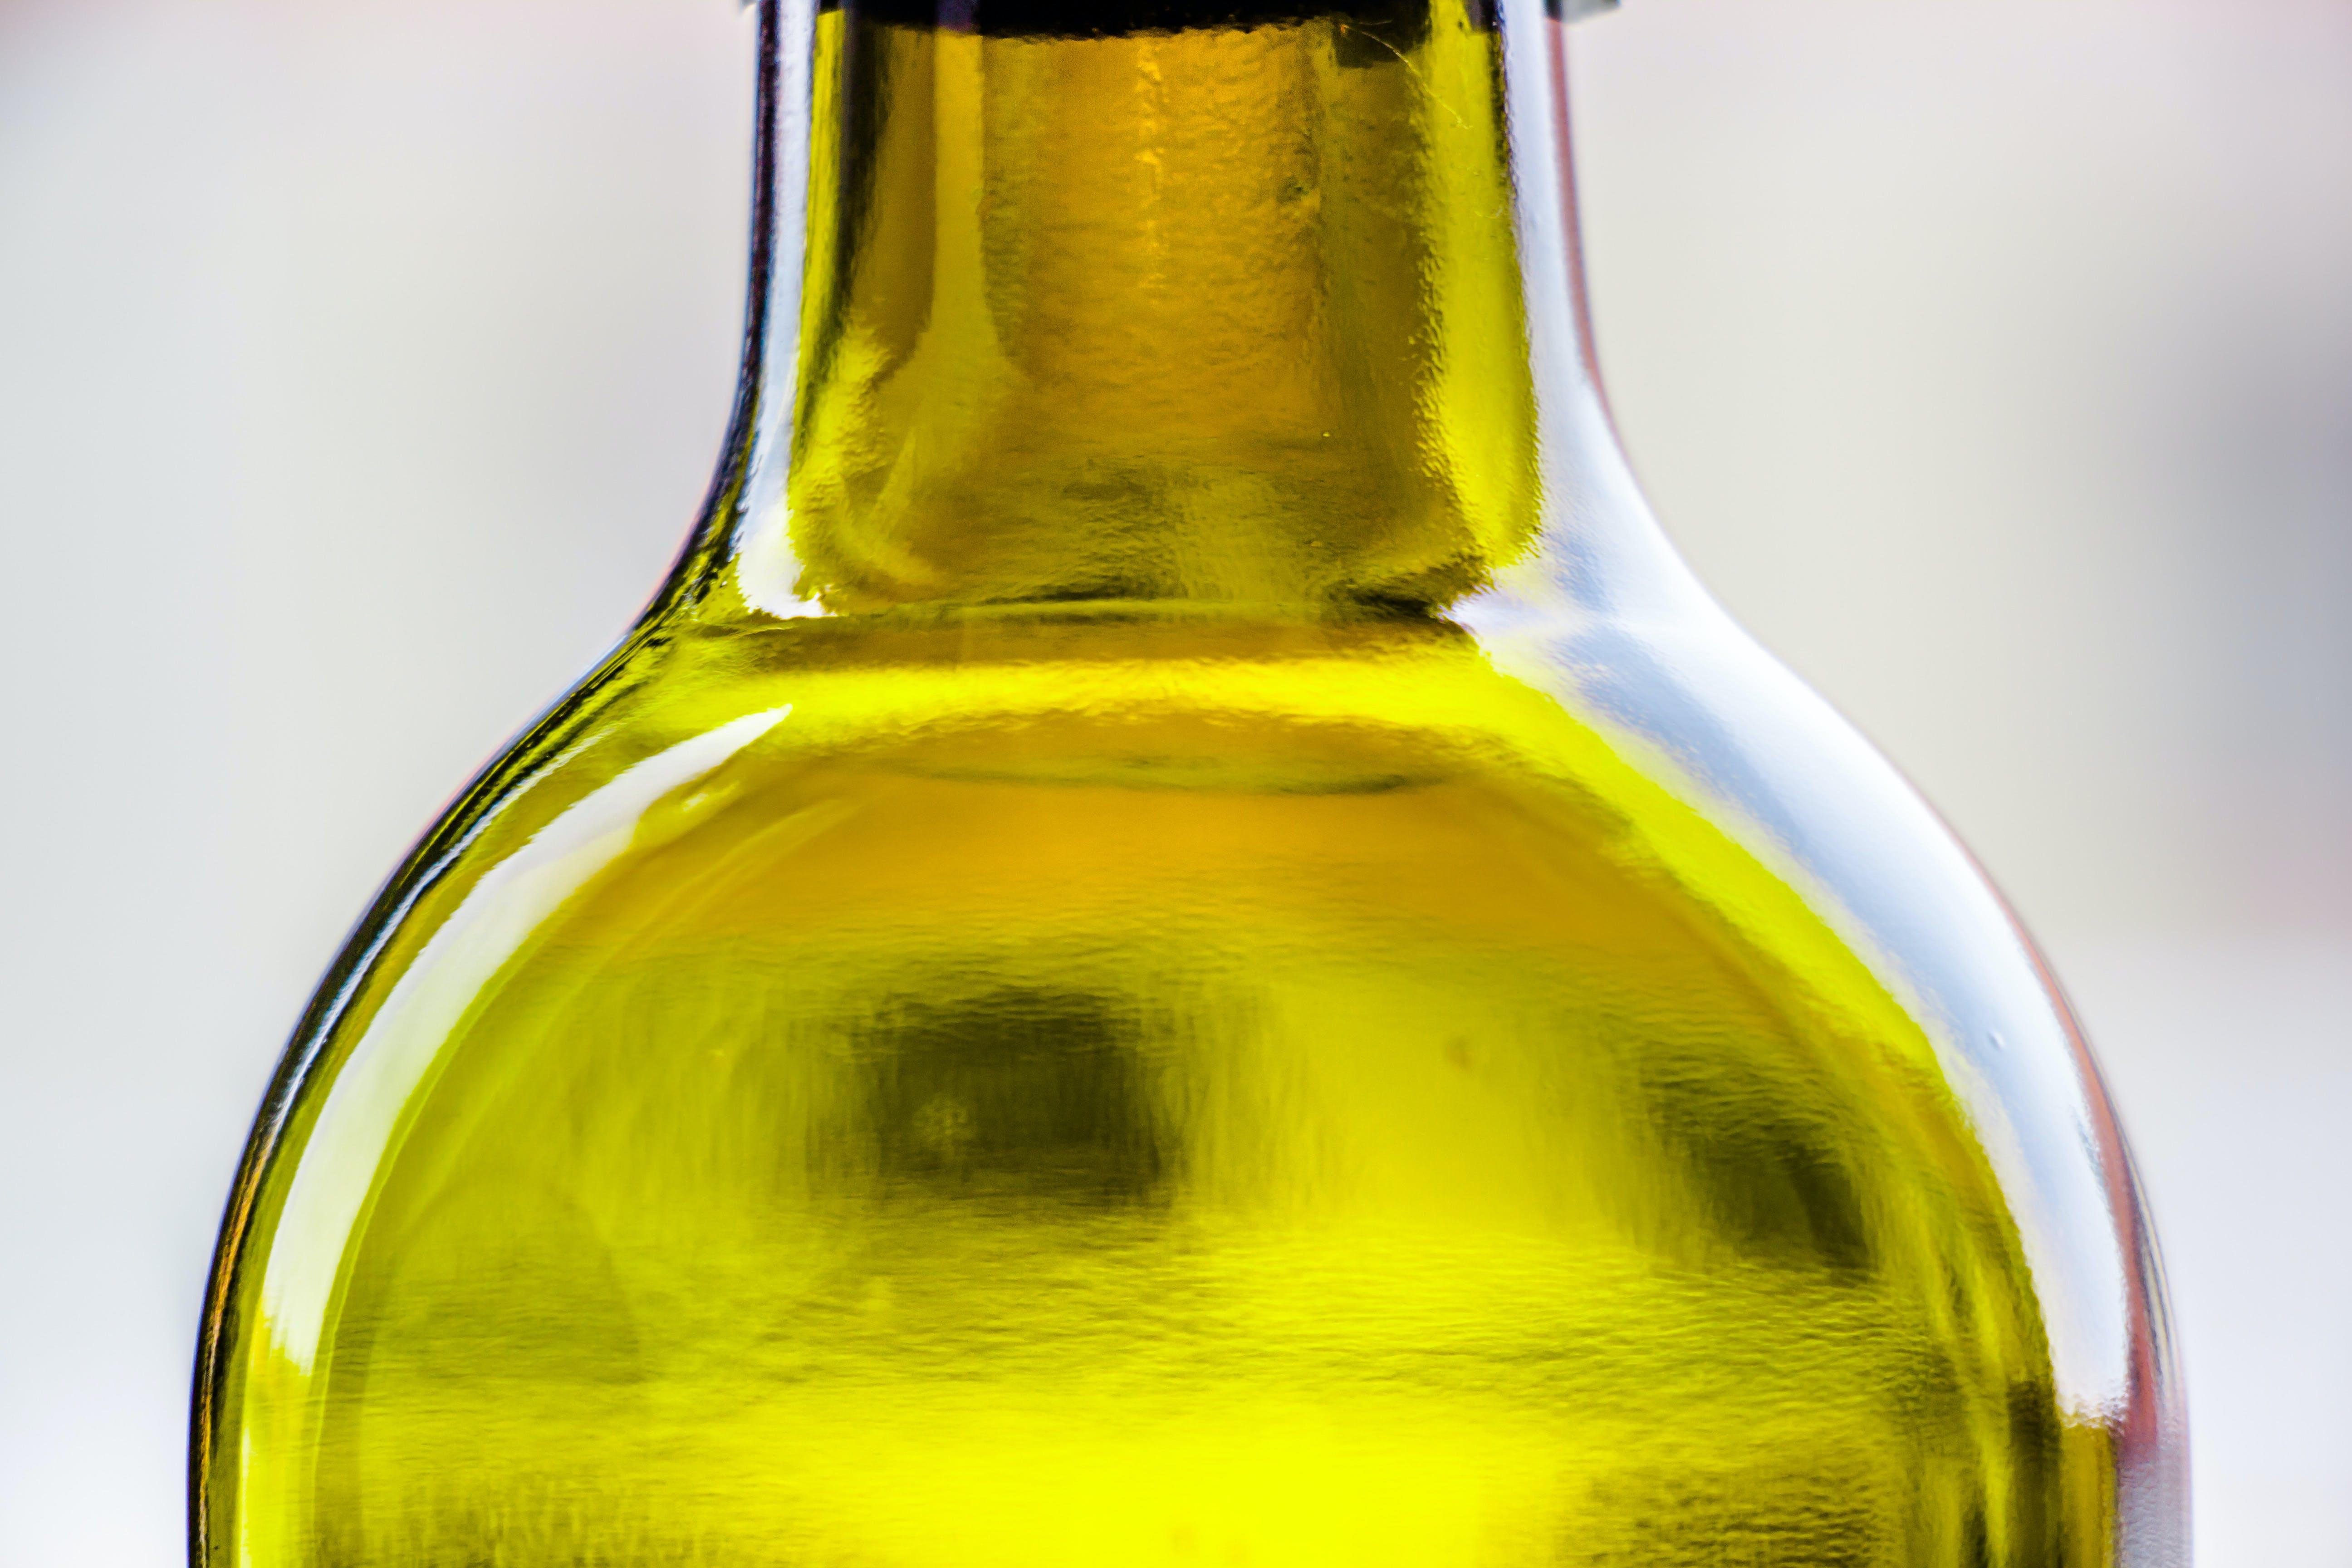 Free stock photo of bottle